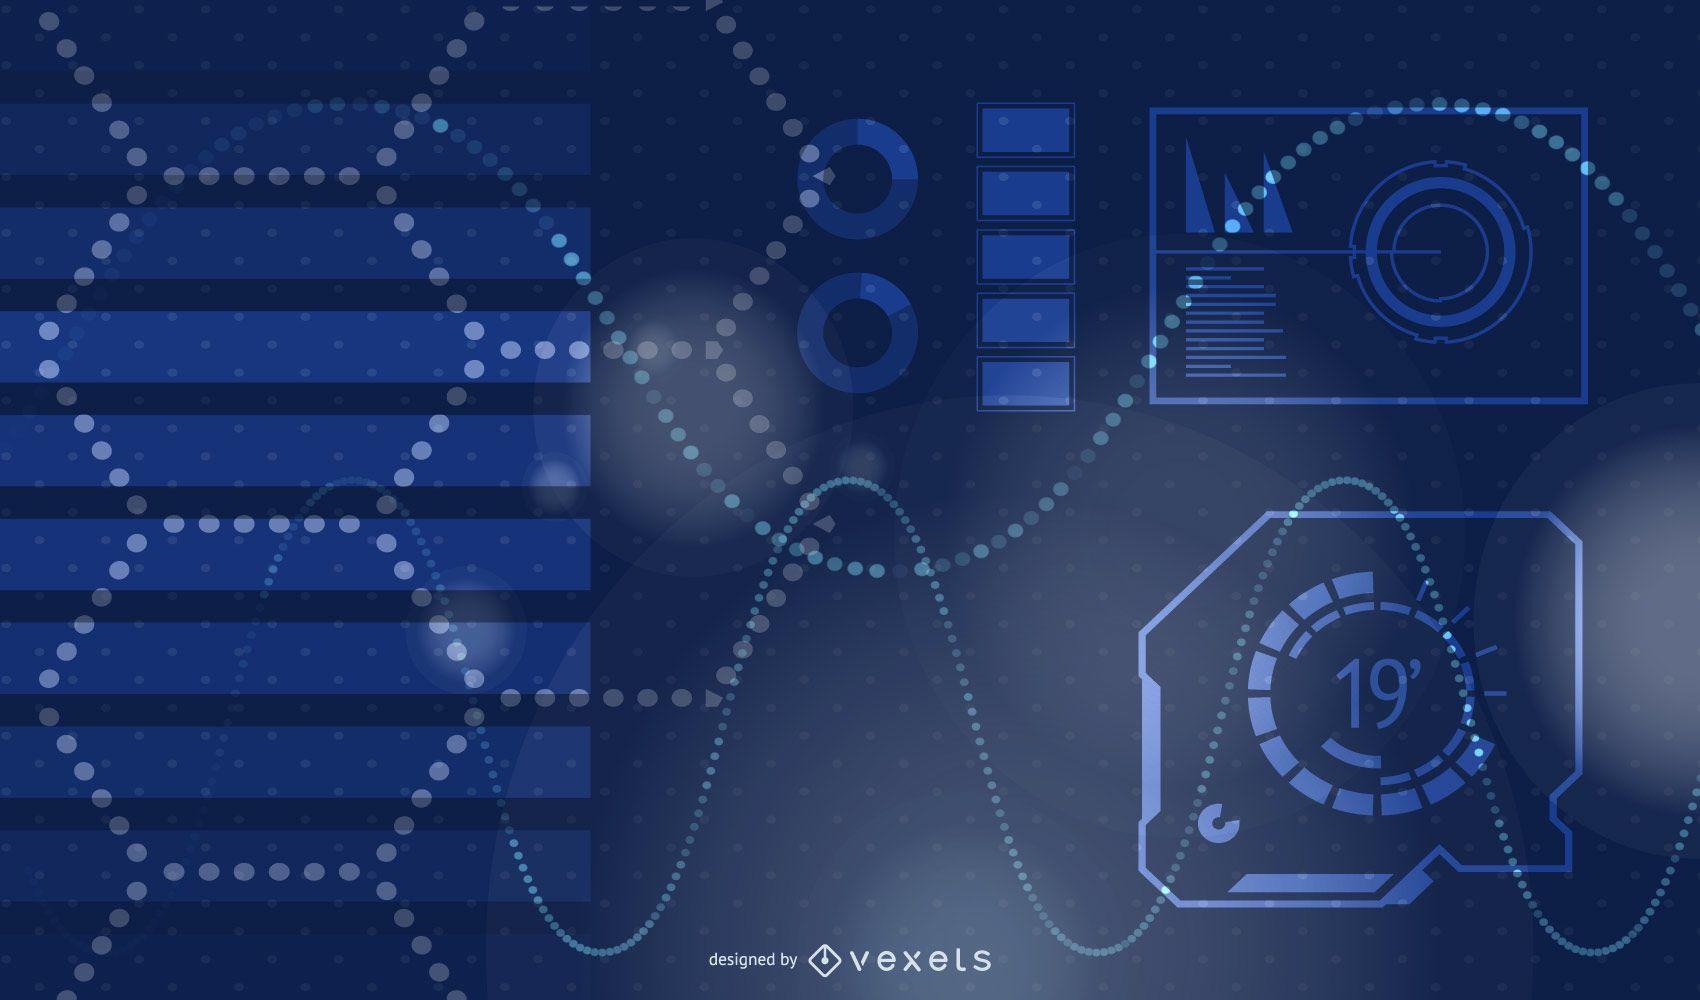 Blue Technology Themed Background Design